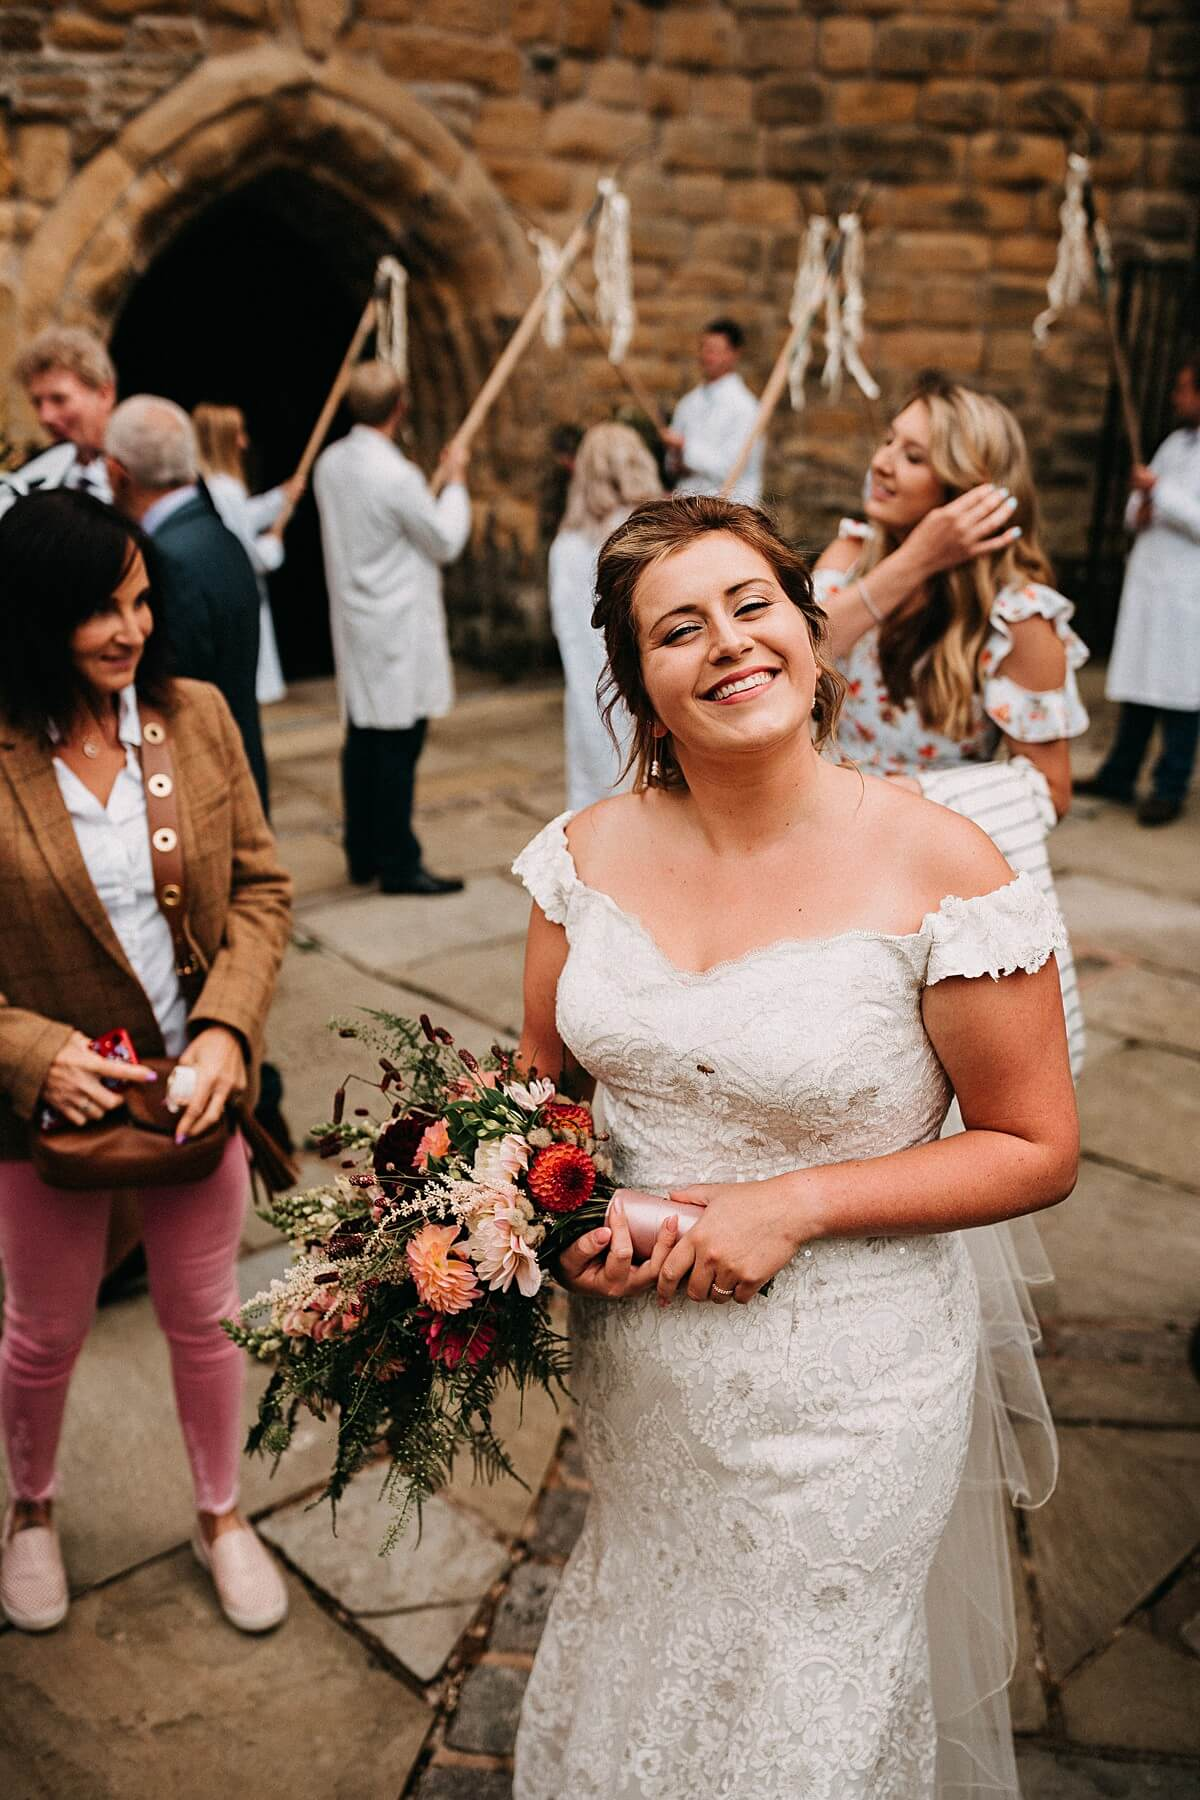 Natural portrait of the bride